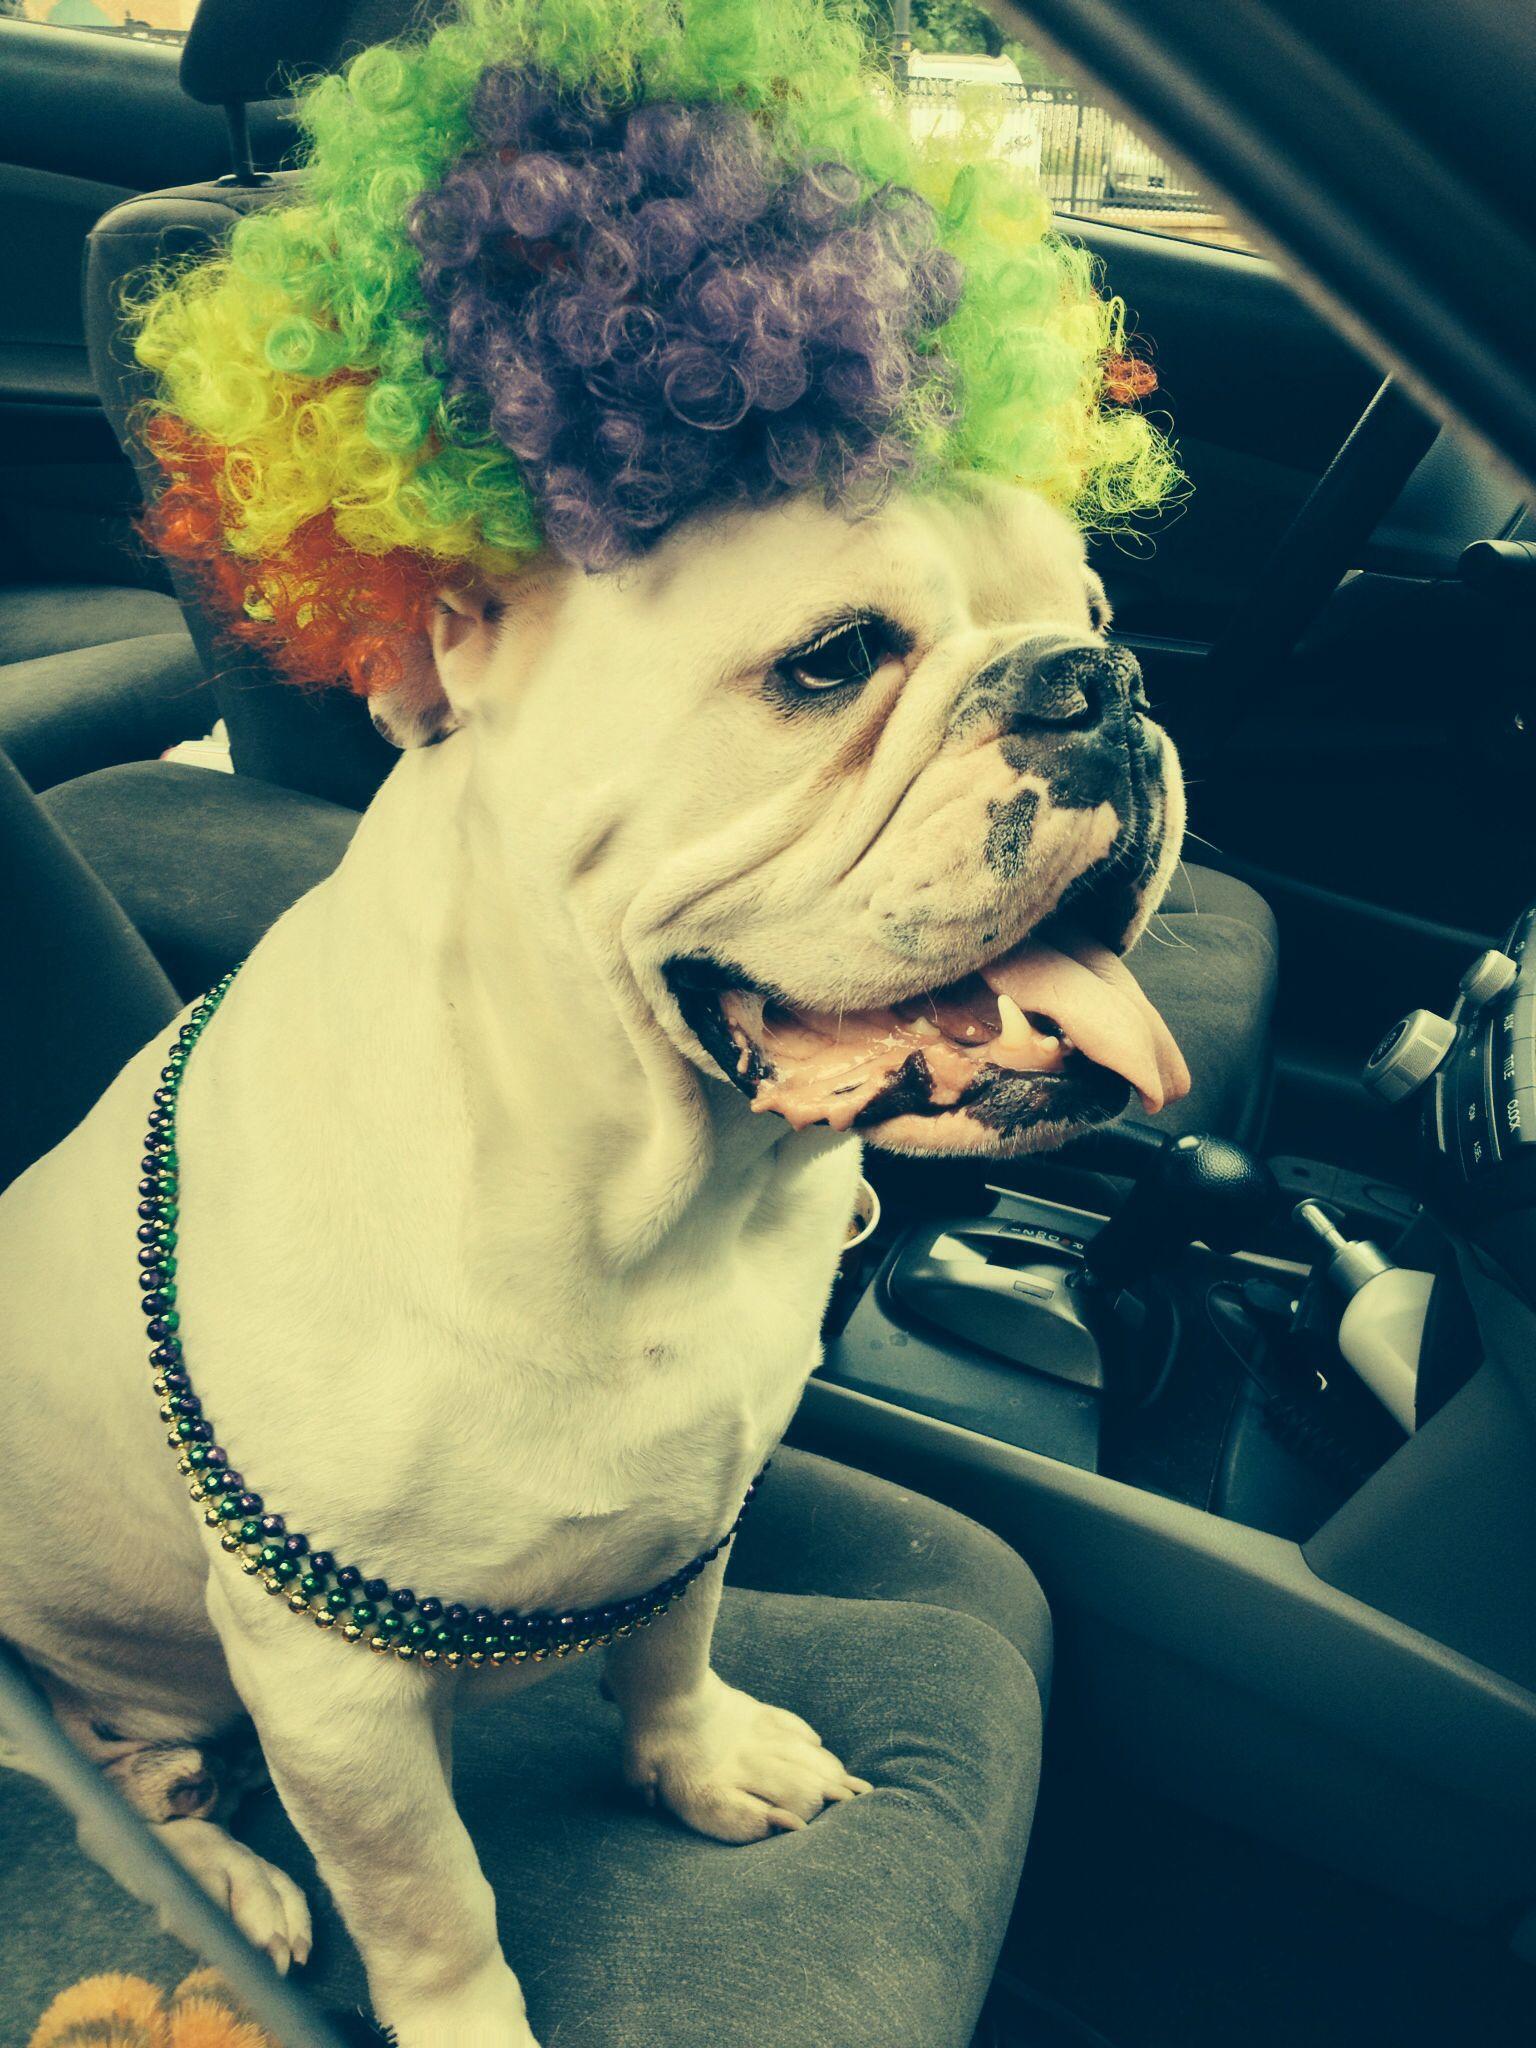 Clownin Around Looks Like Kingsley Ready For A Party Bulldog